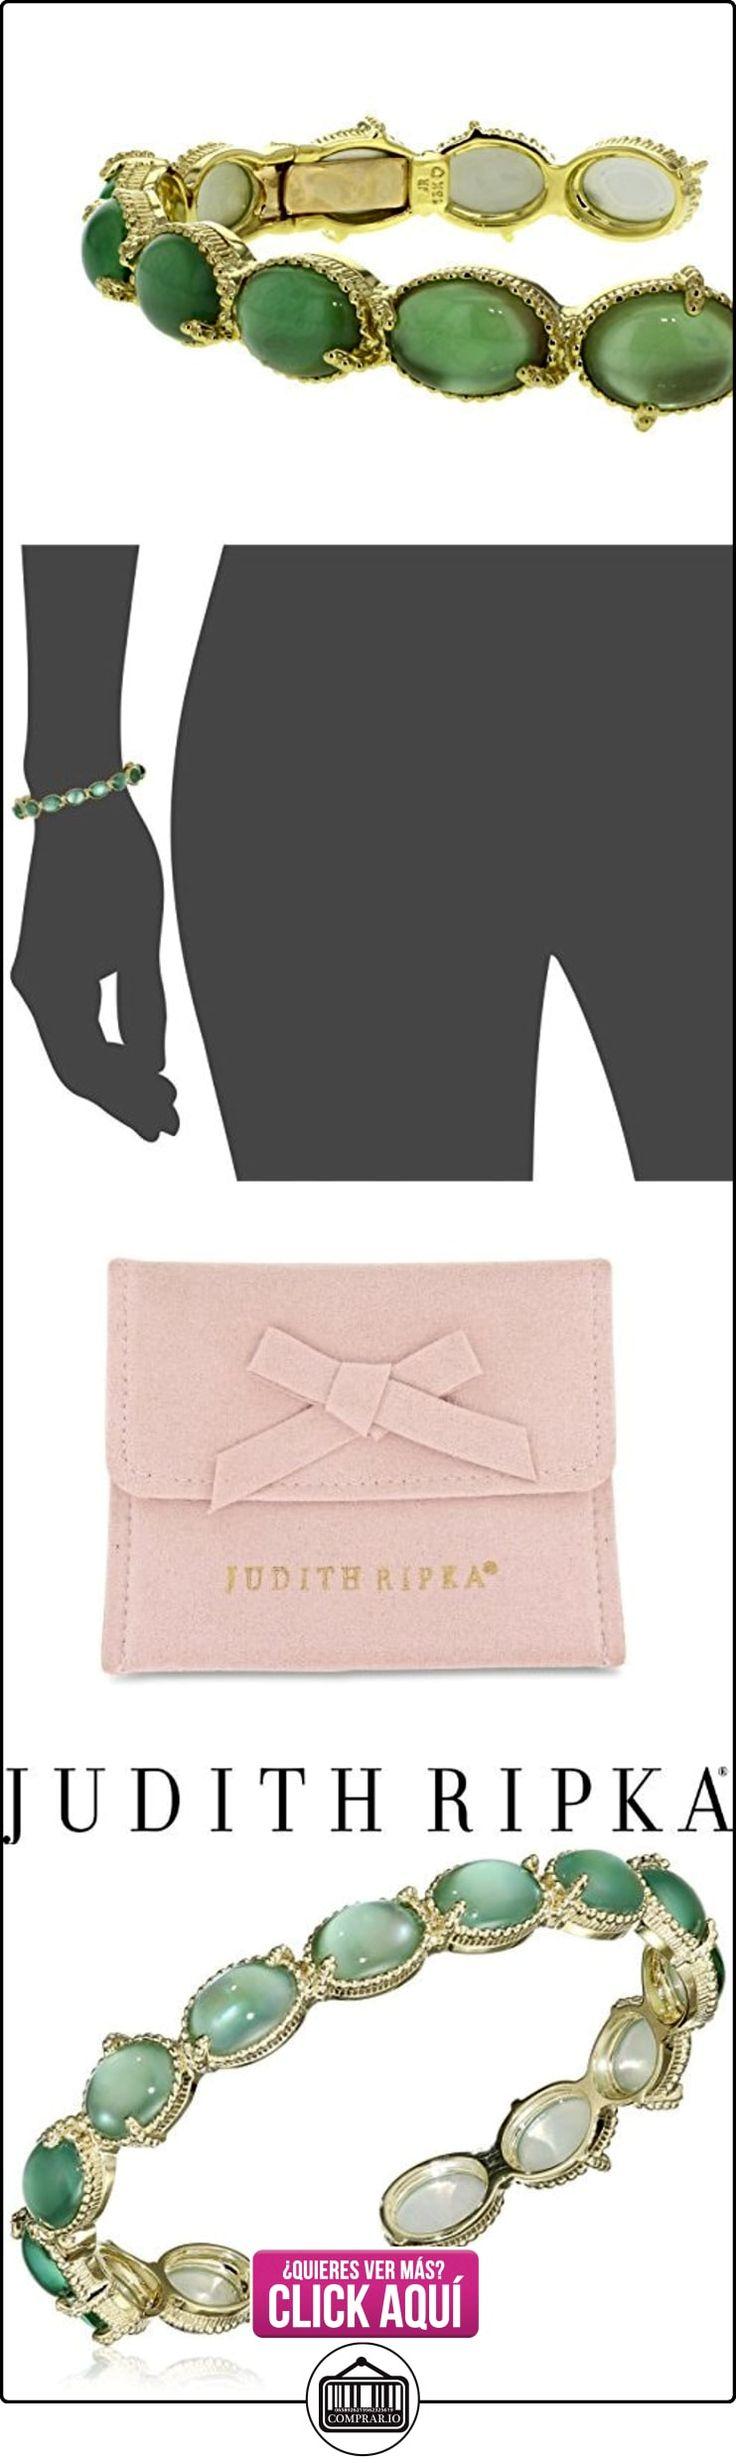 The Judith Ripka Companies, Inc Brazalete de Mujer Oro Amarillo 18 k (750) Cuarzo Verde Talla Ovalada  ✿ Relojes para mujer - (Lujo) ✿ ▬► Ver oferta: http://comprar.io/goto/B00QGJ07HA